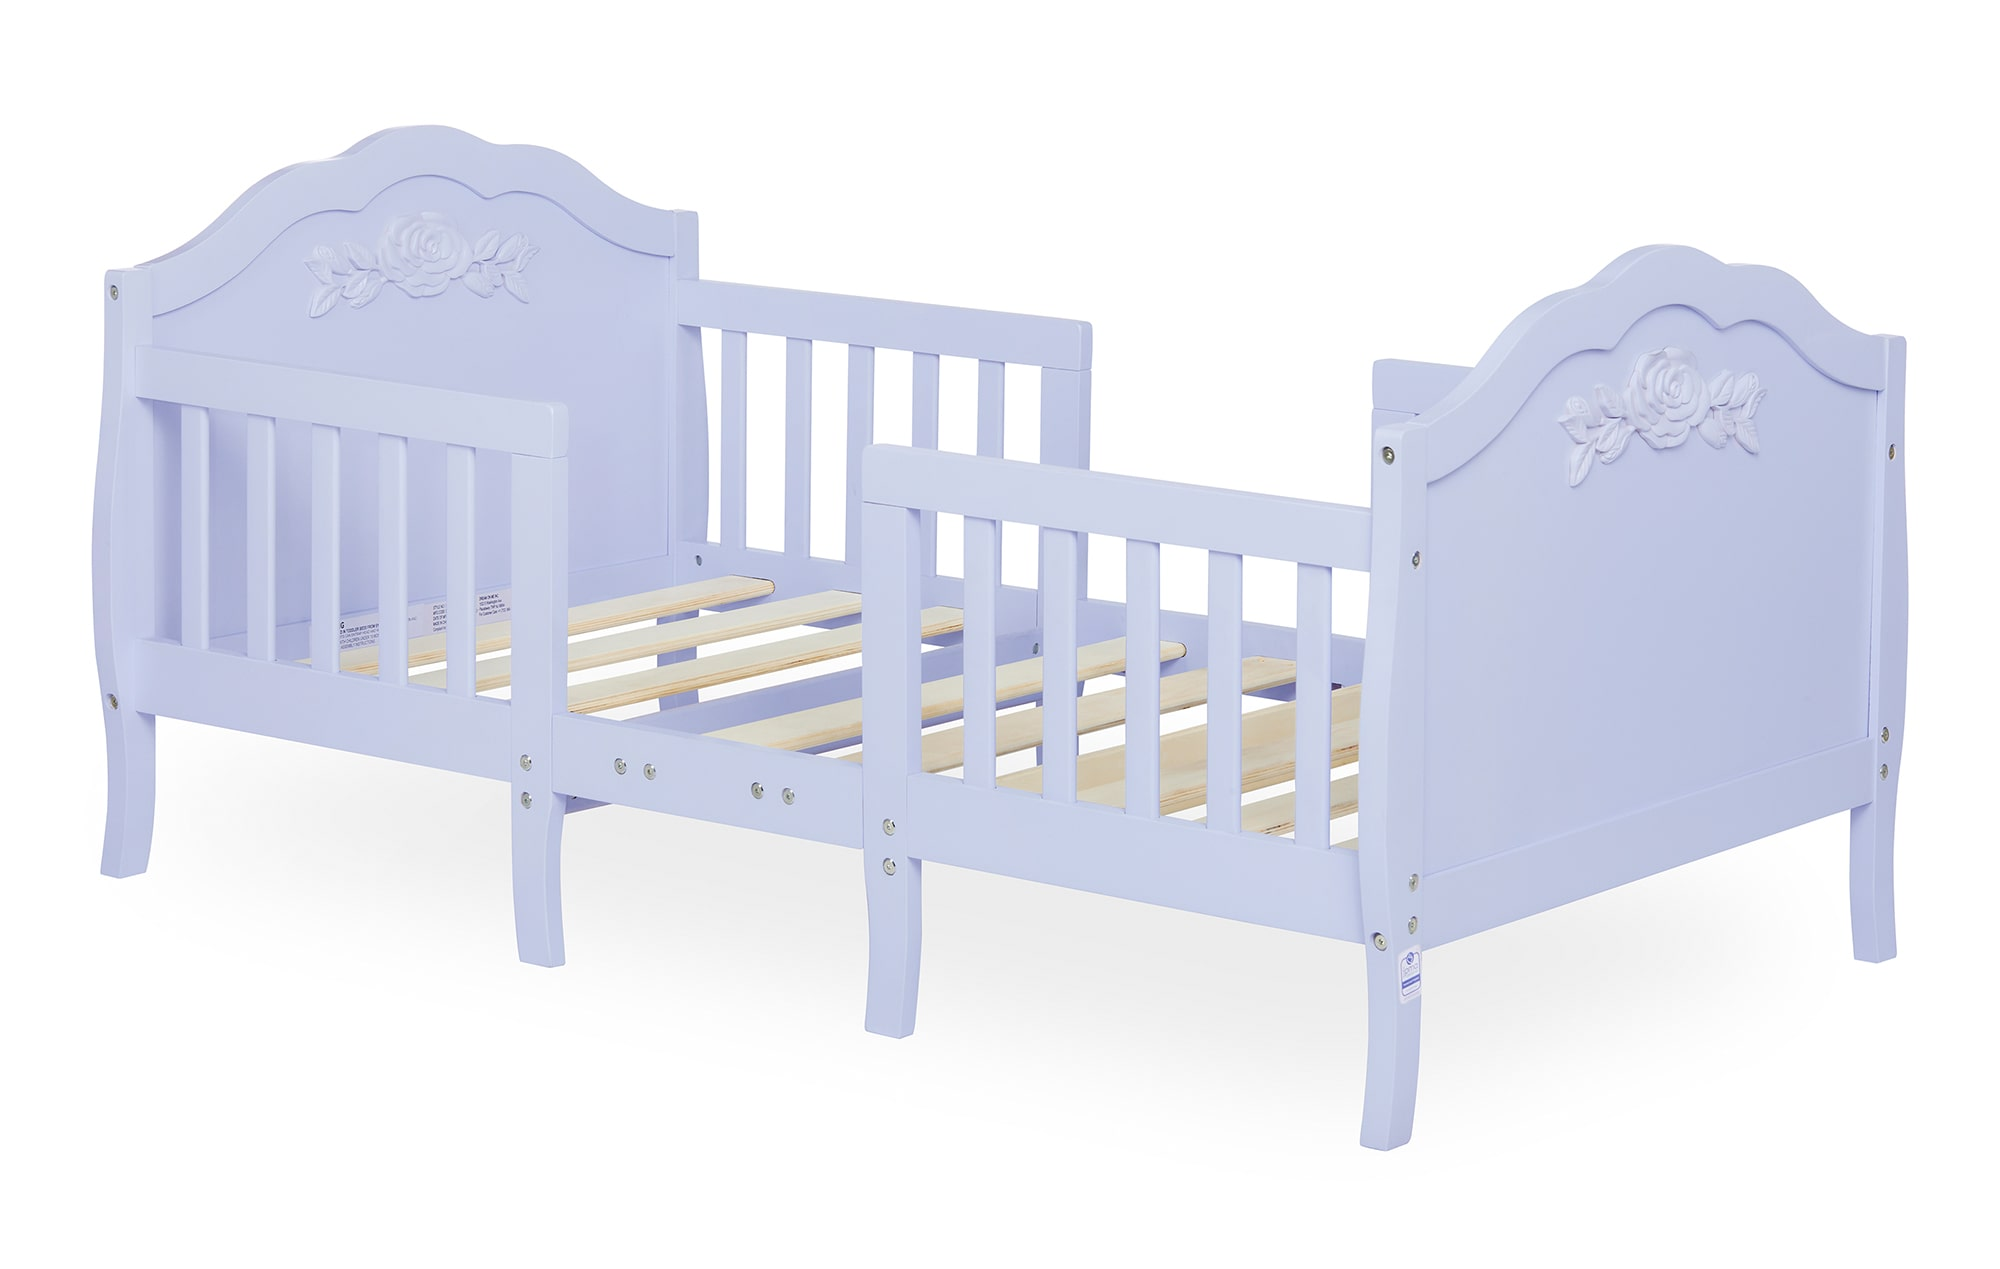 640_LAVD Rose Toddler Bed Silo 2